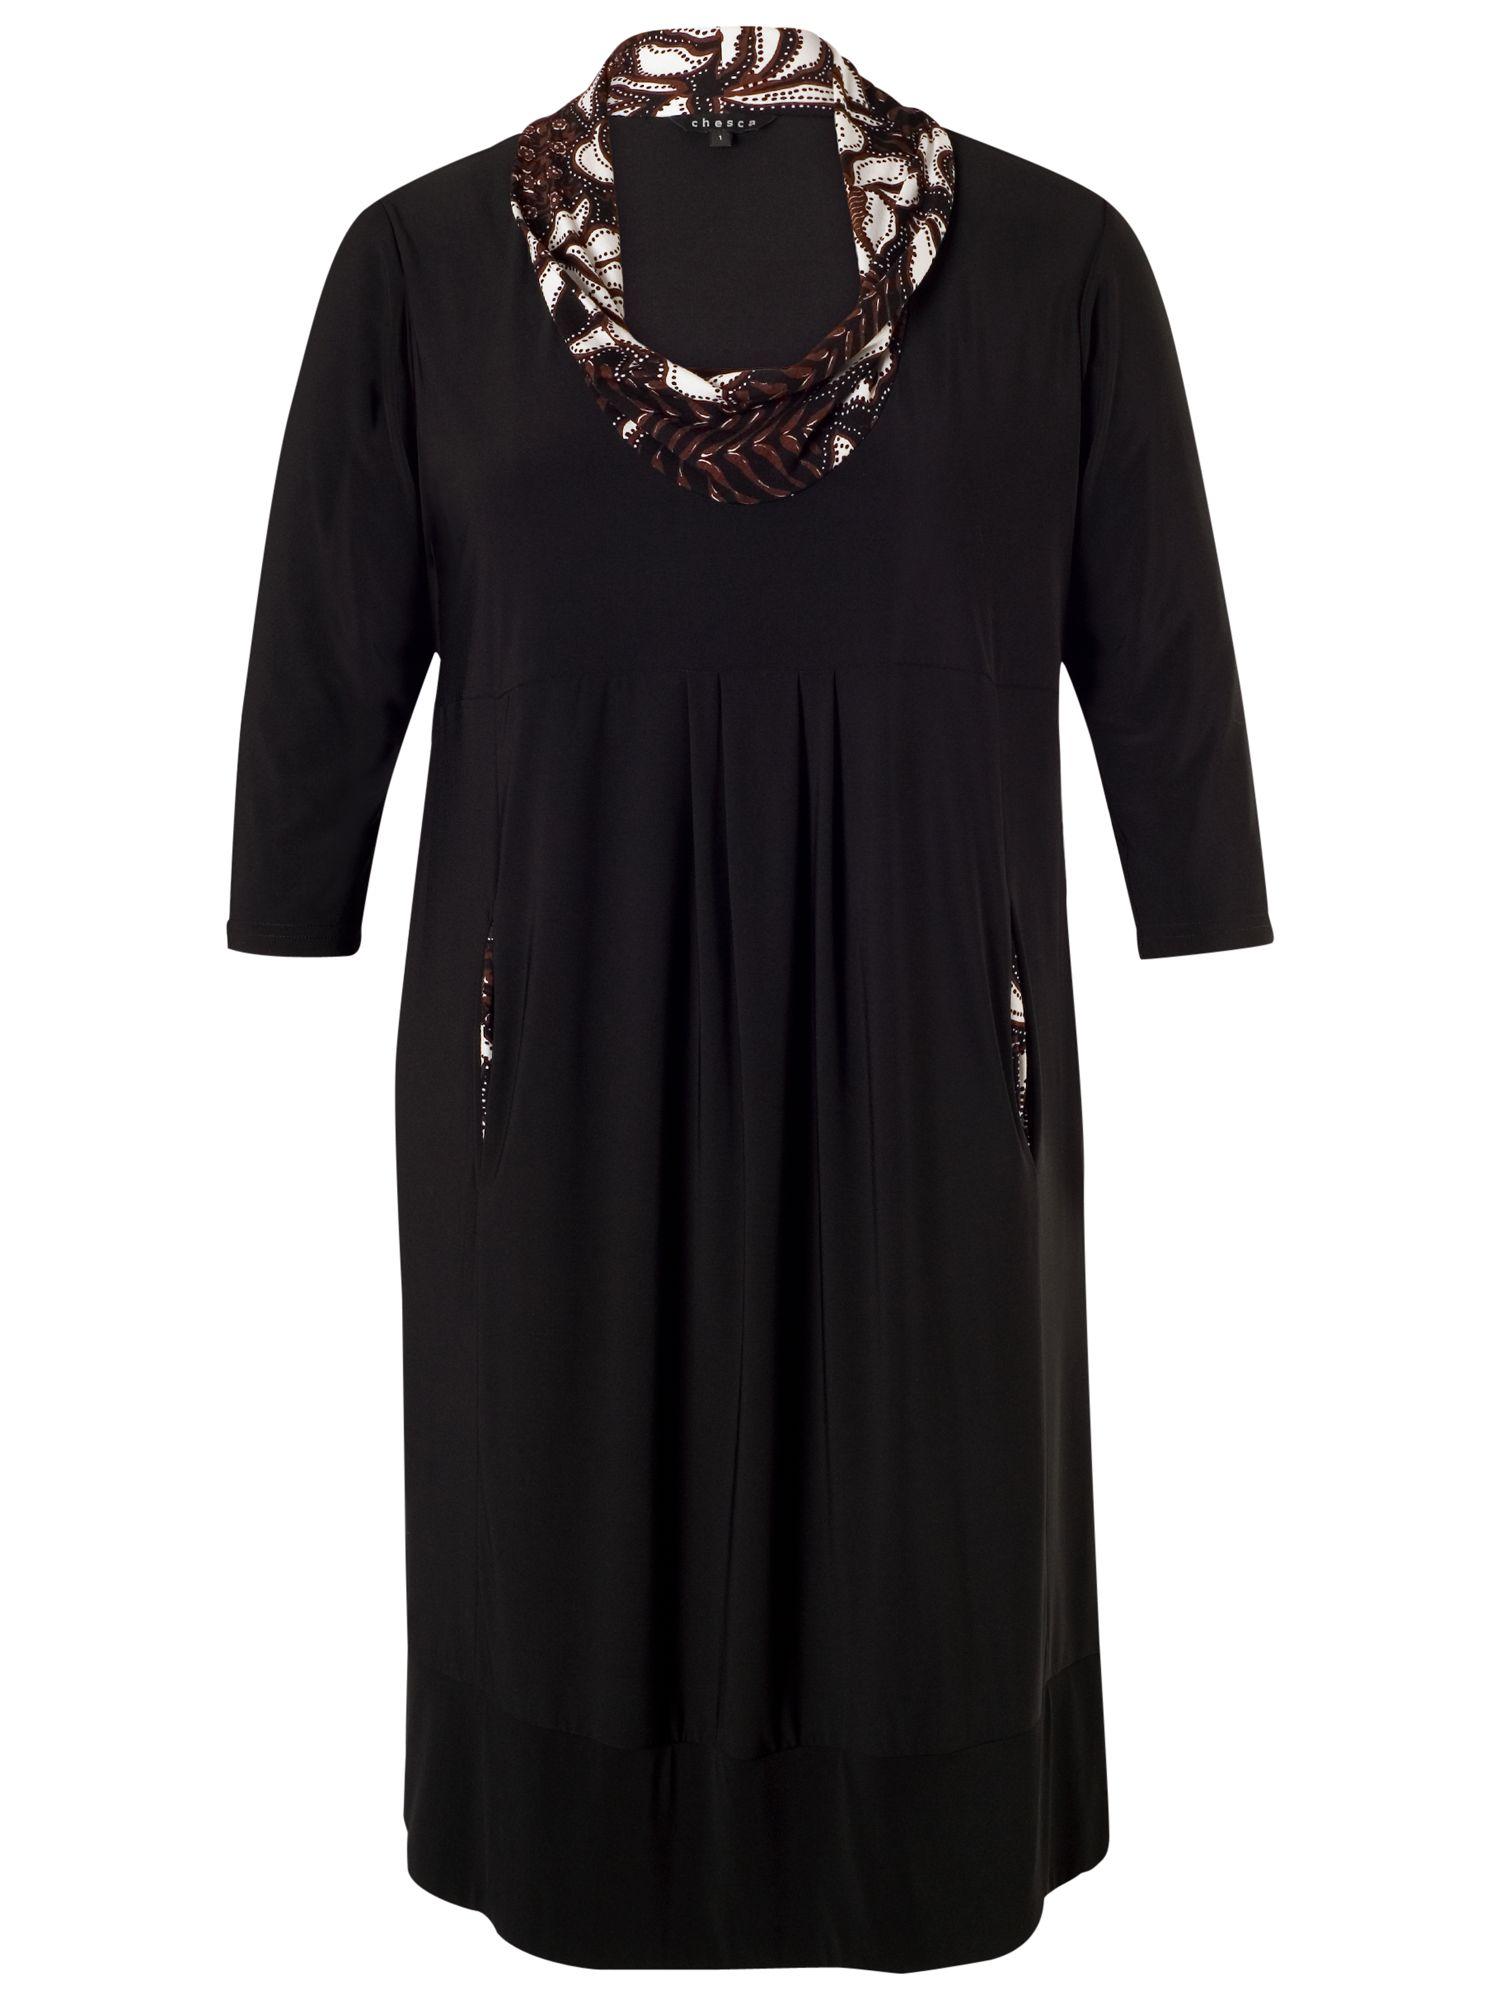 chesca jersey dress black, chesca, jersey, dress, black, 12-14|24-26|20-22|16-18, women, plus size, womens dresses, 1783379